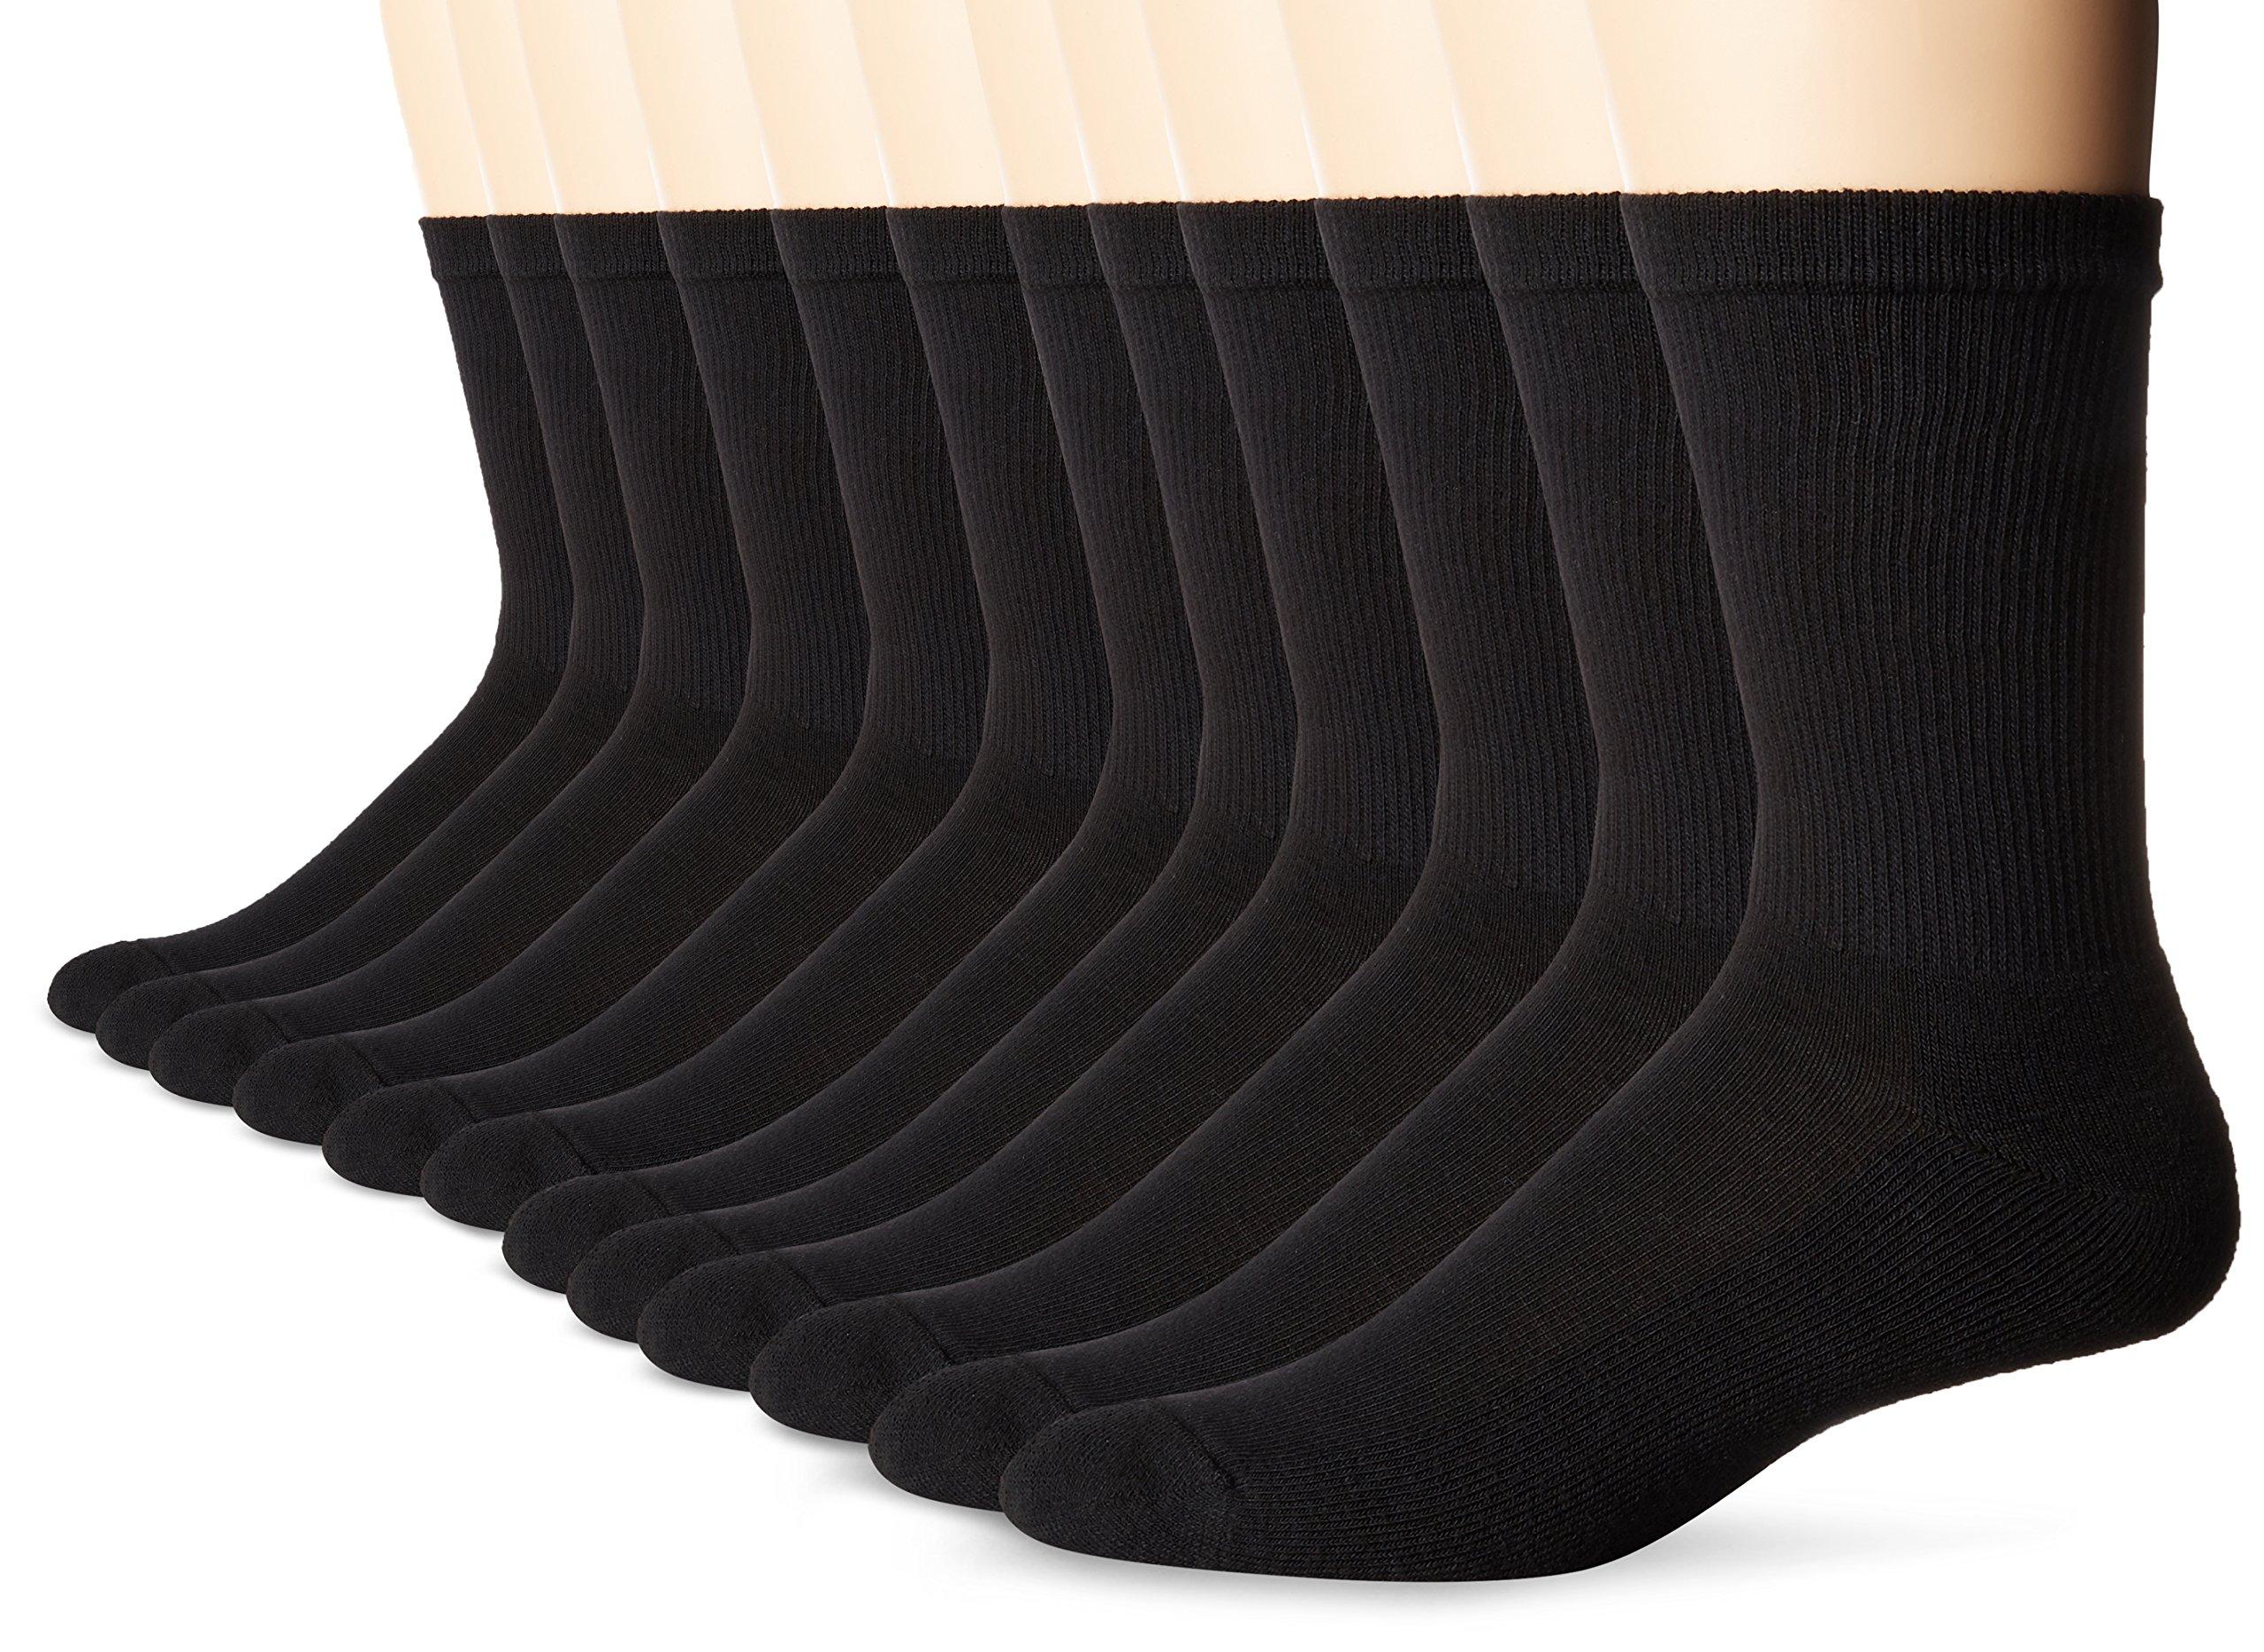 Hanes Men's Active Cool 12-Pack Crew Socks, Black, Sock Size: 10-13 Shoe Size: 6-12